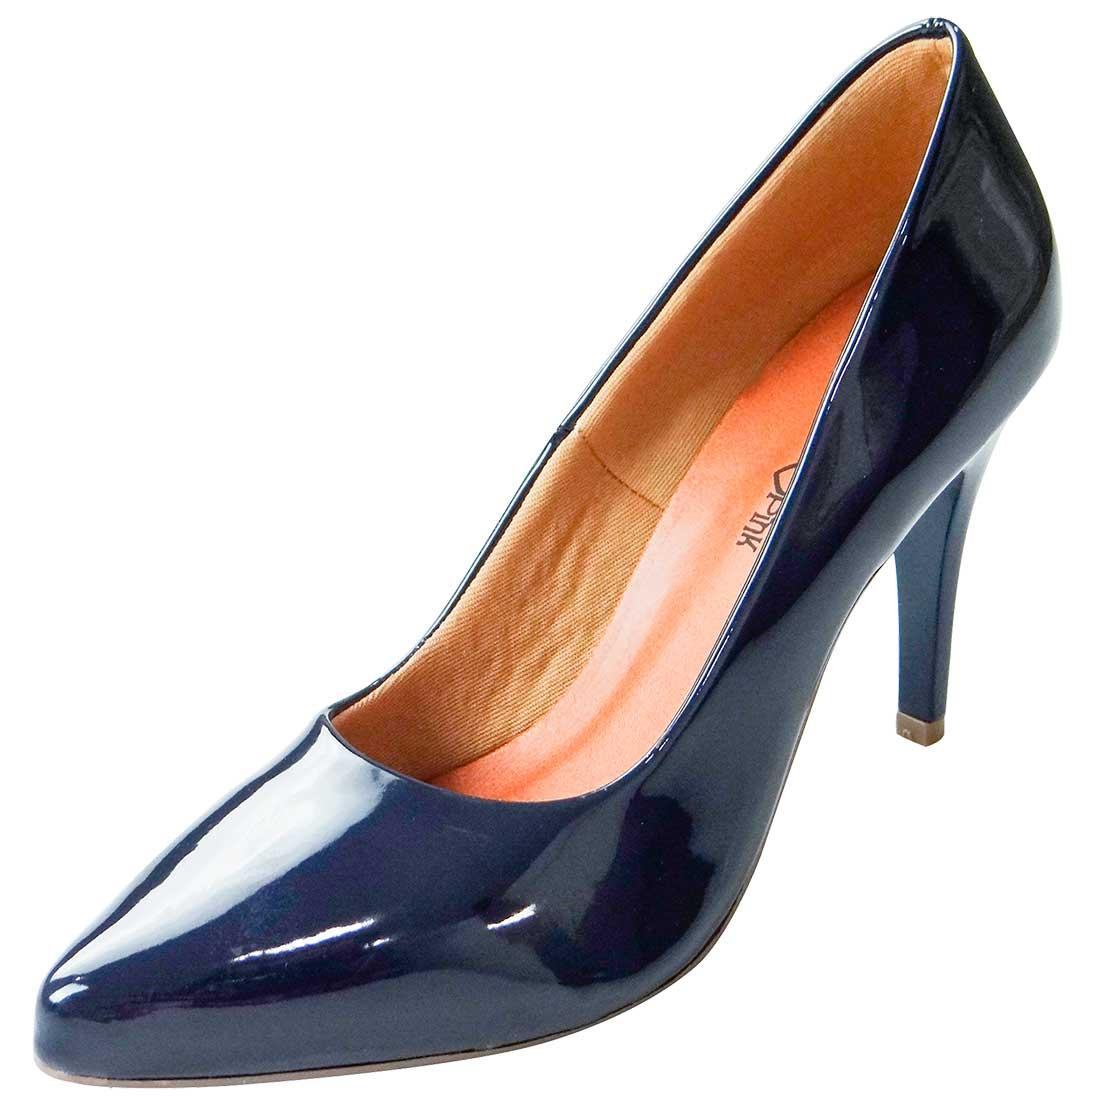 Scarpin Verniz Bico Fino - Azul